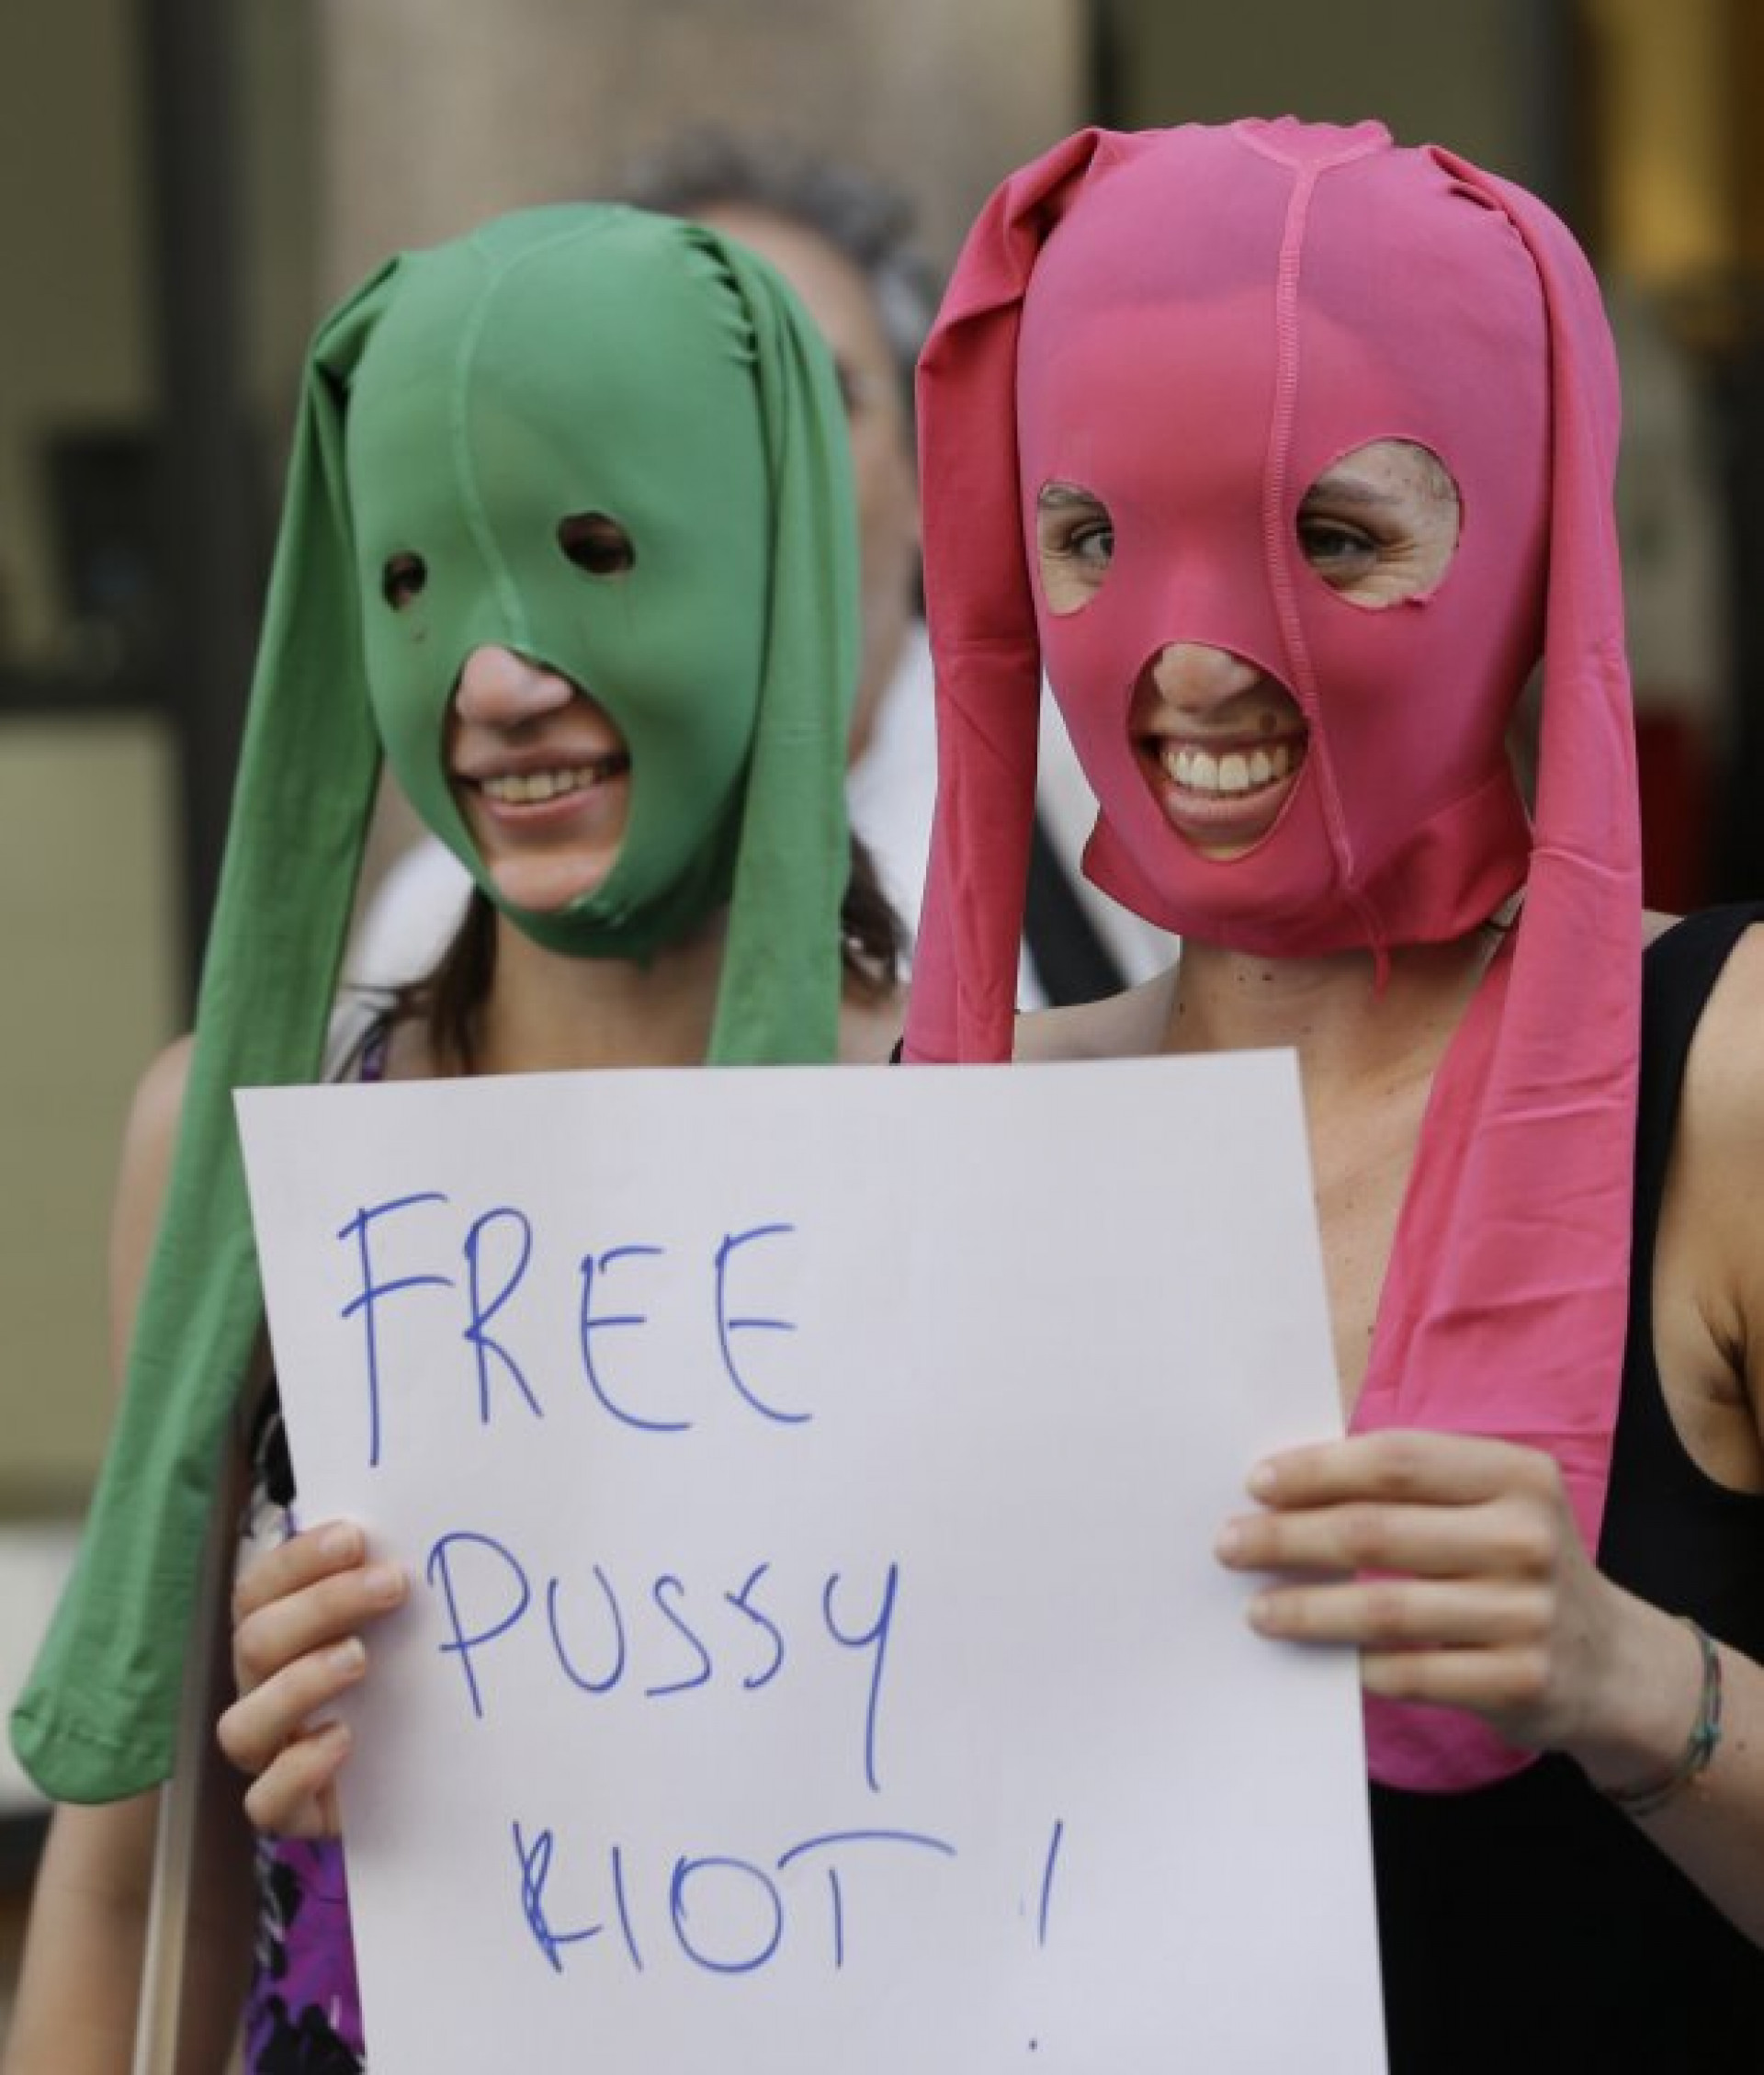 Busty women on nude beaches